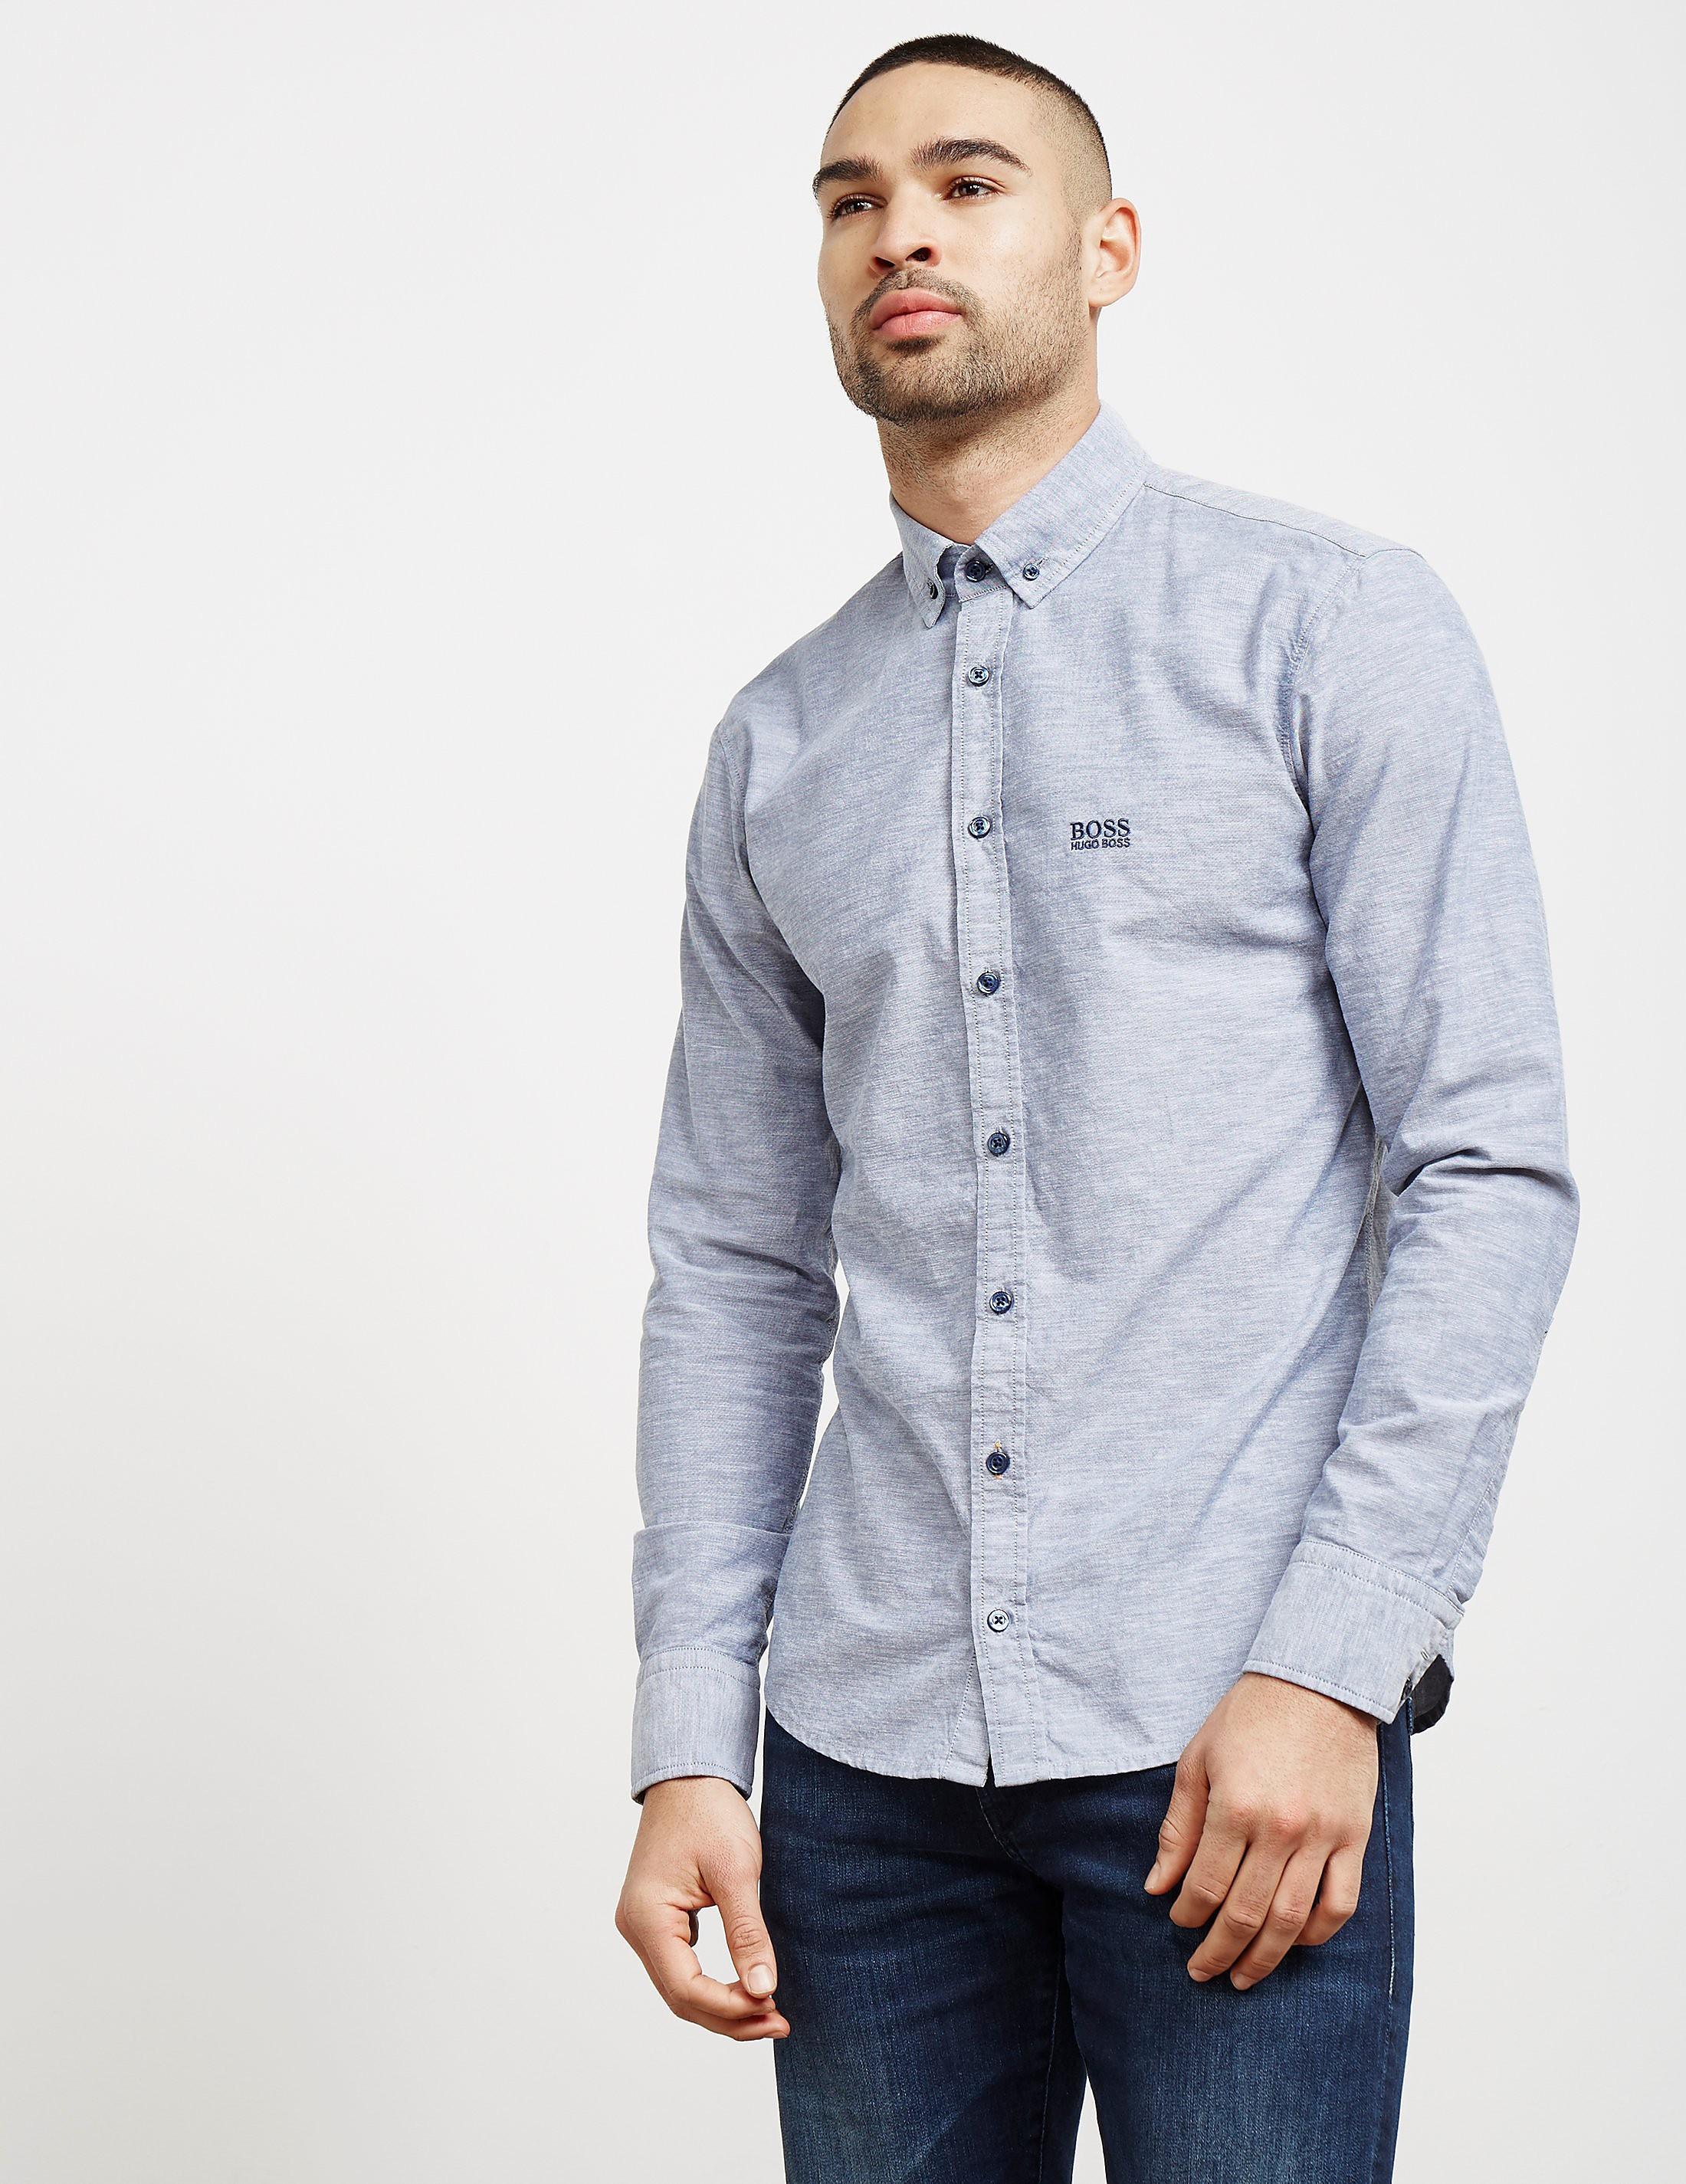 BOSS Preppy Oxford Long Sleeve Shirt